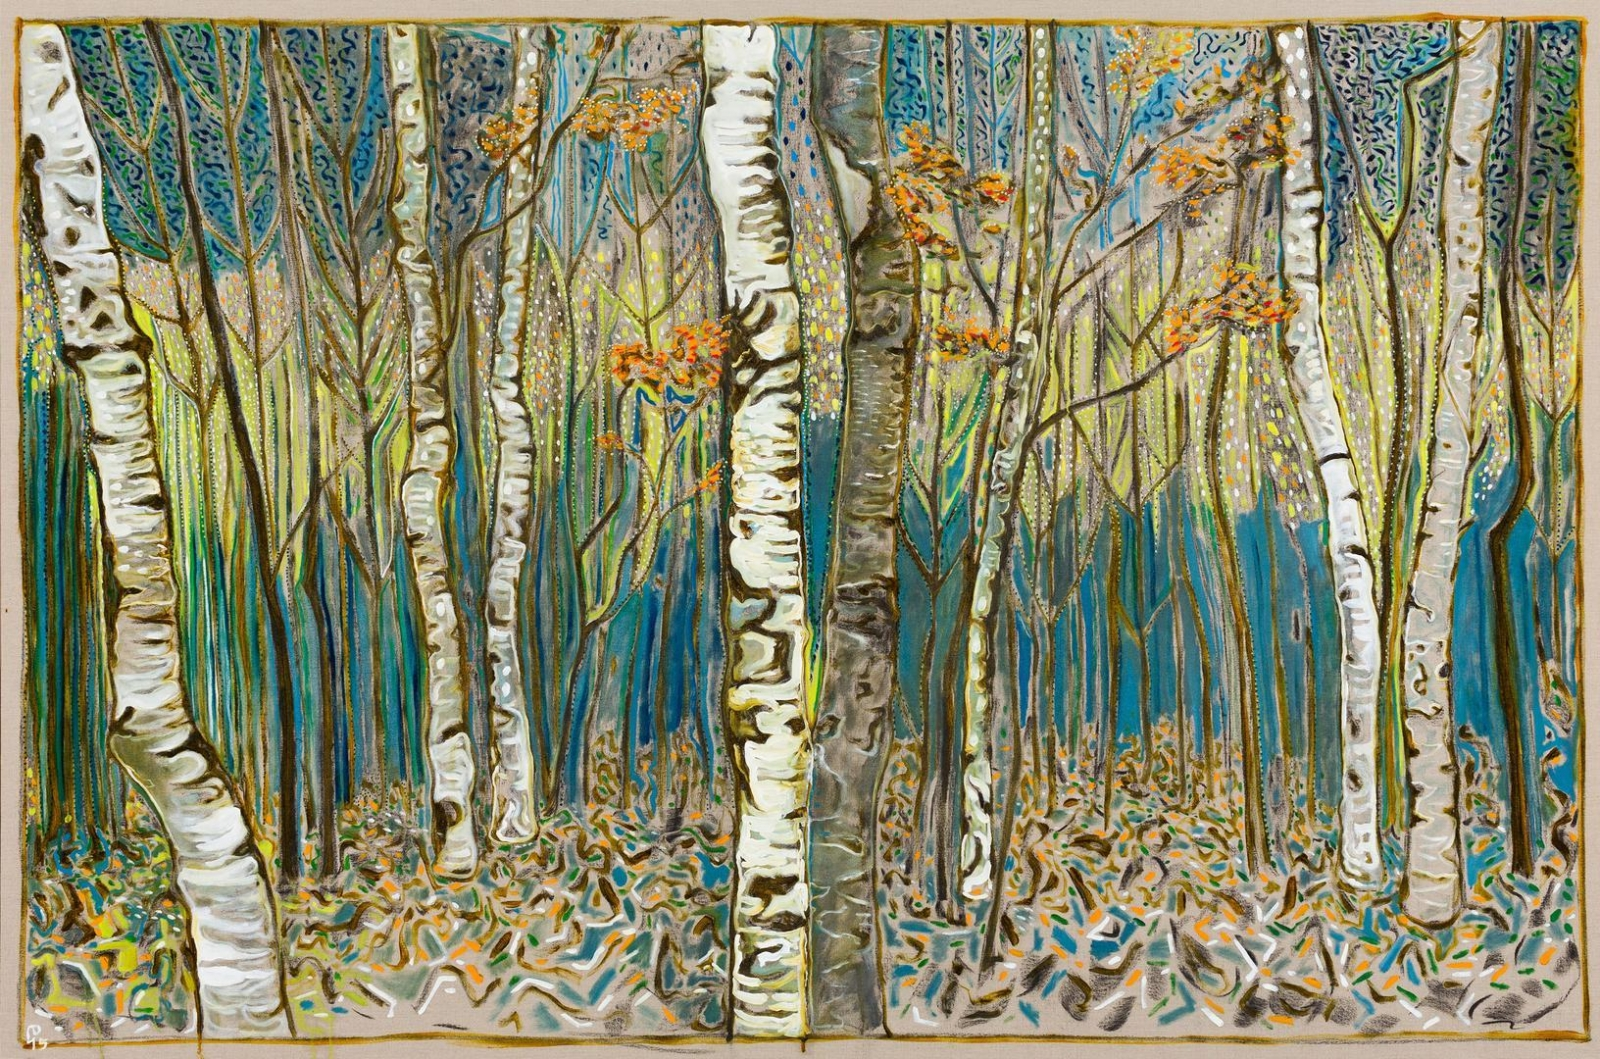 BILLY CHILDISH birch wood, 2015